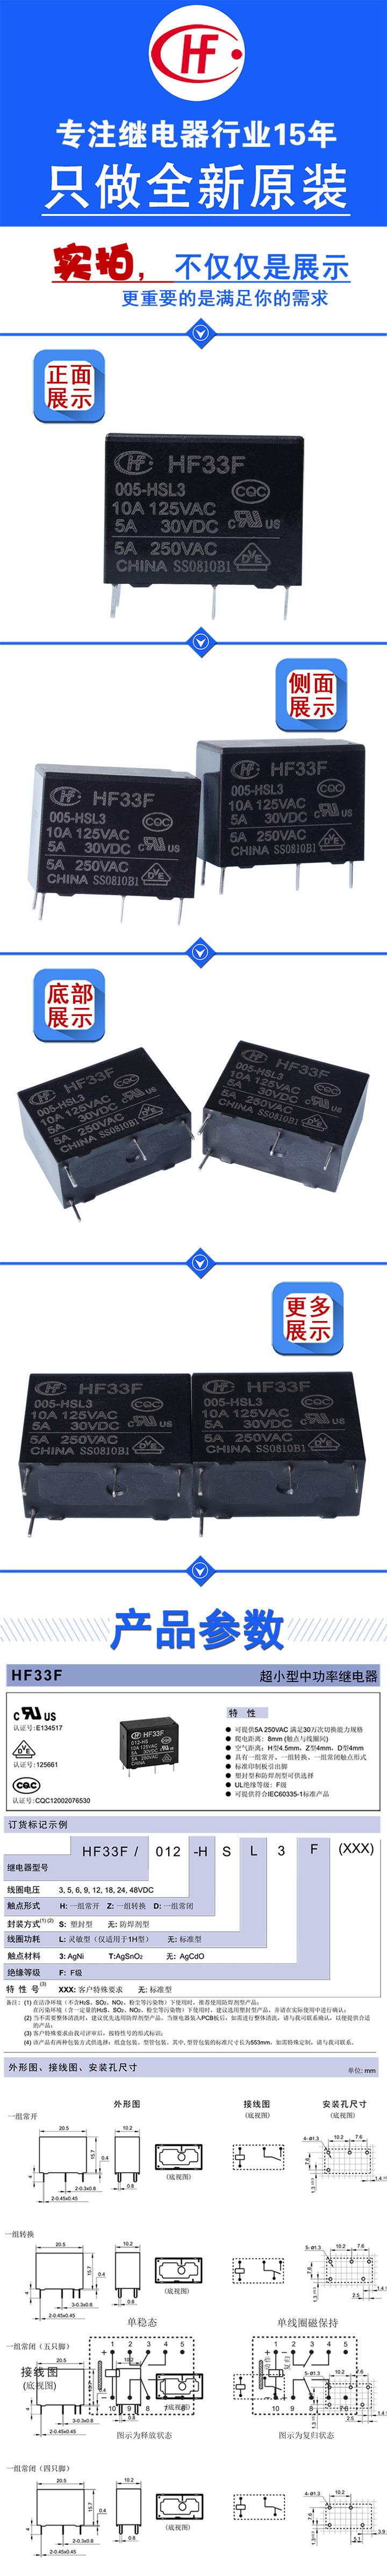 HF33F-005-HSL3_01